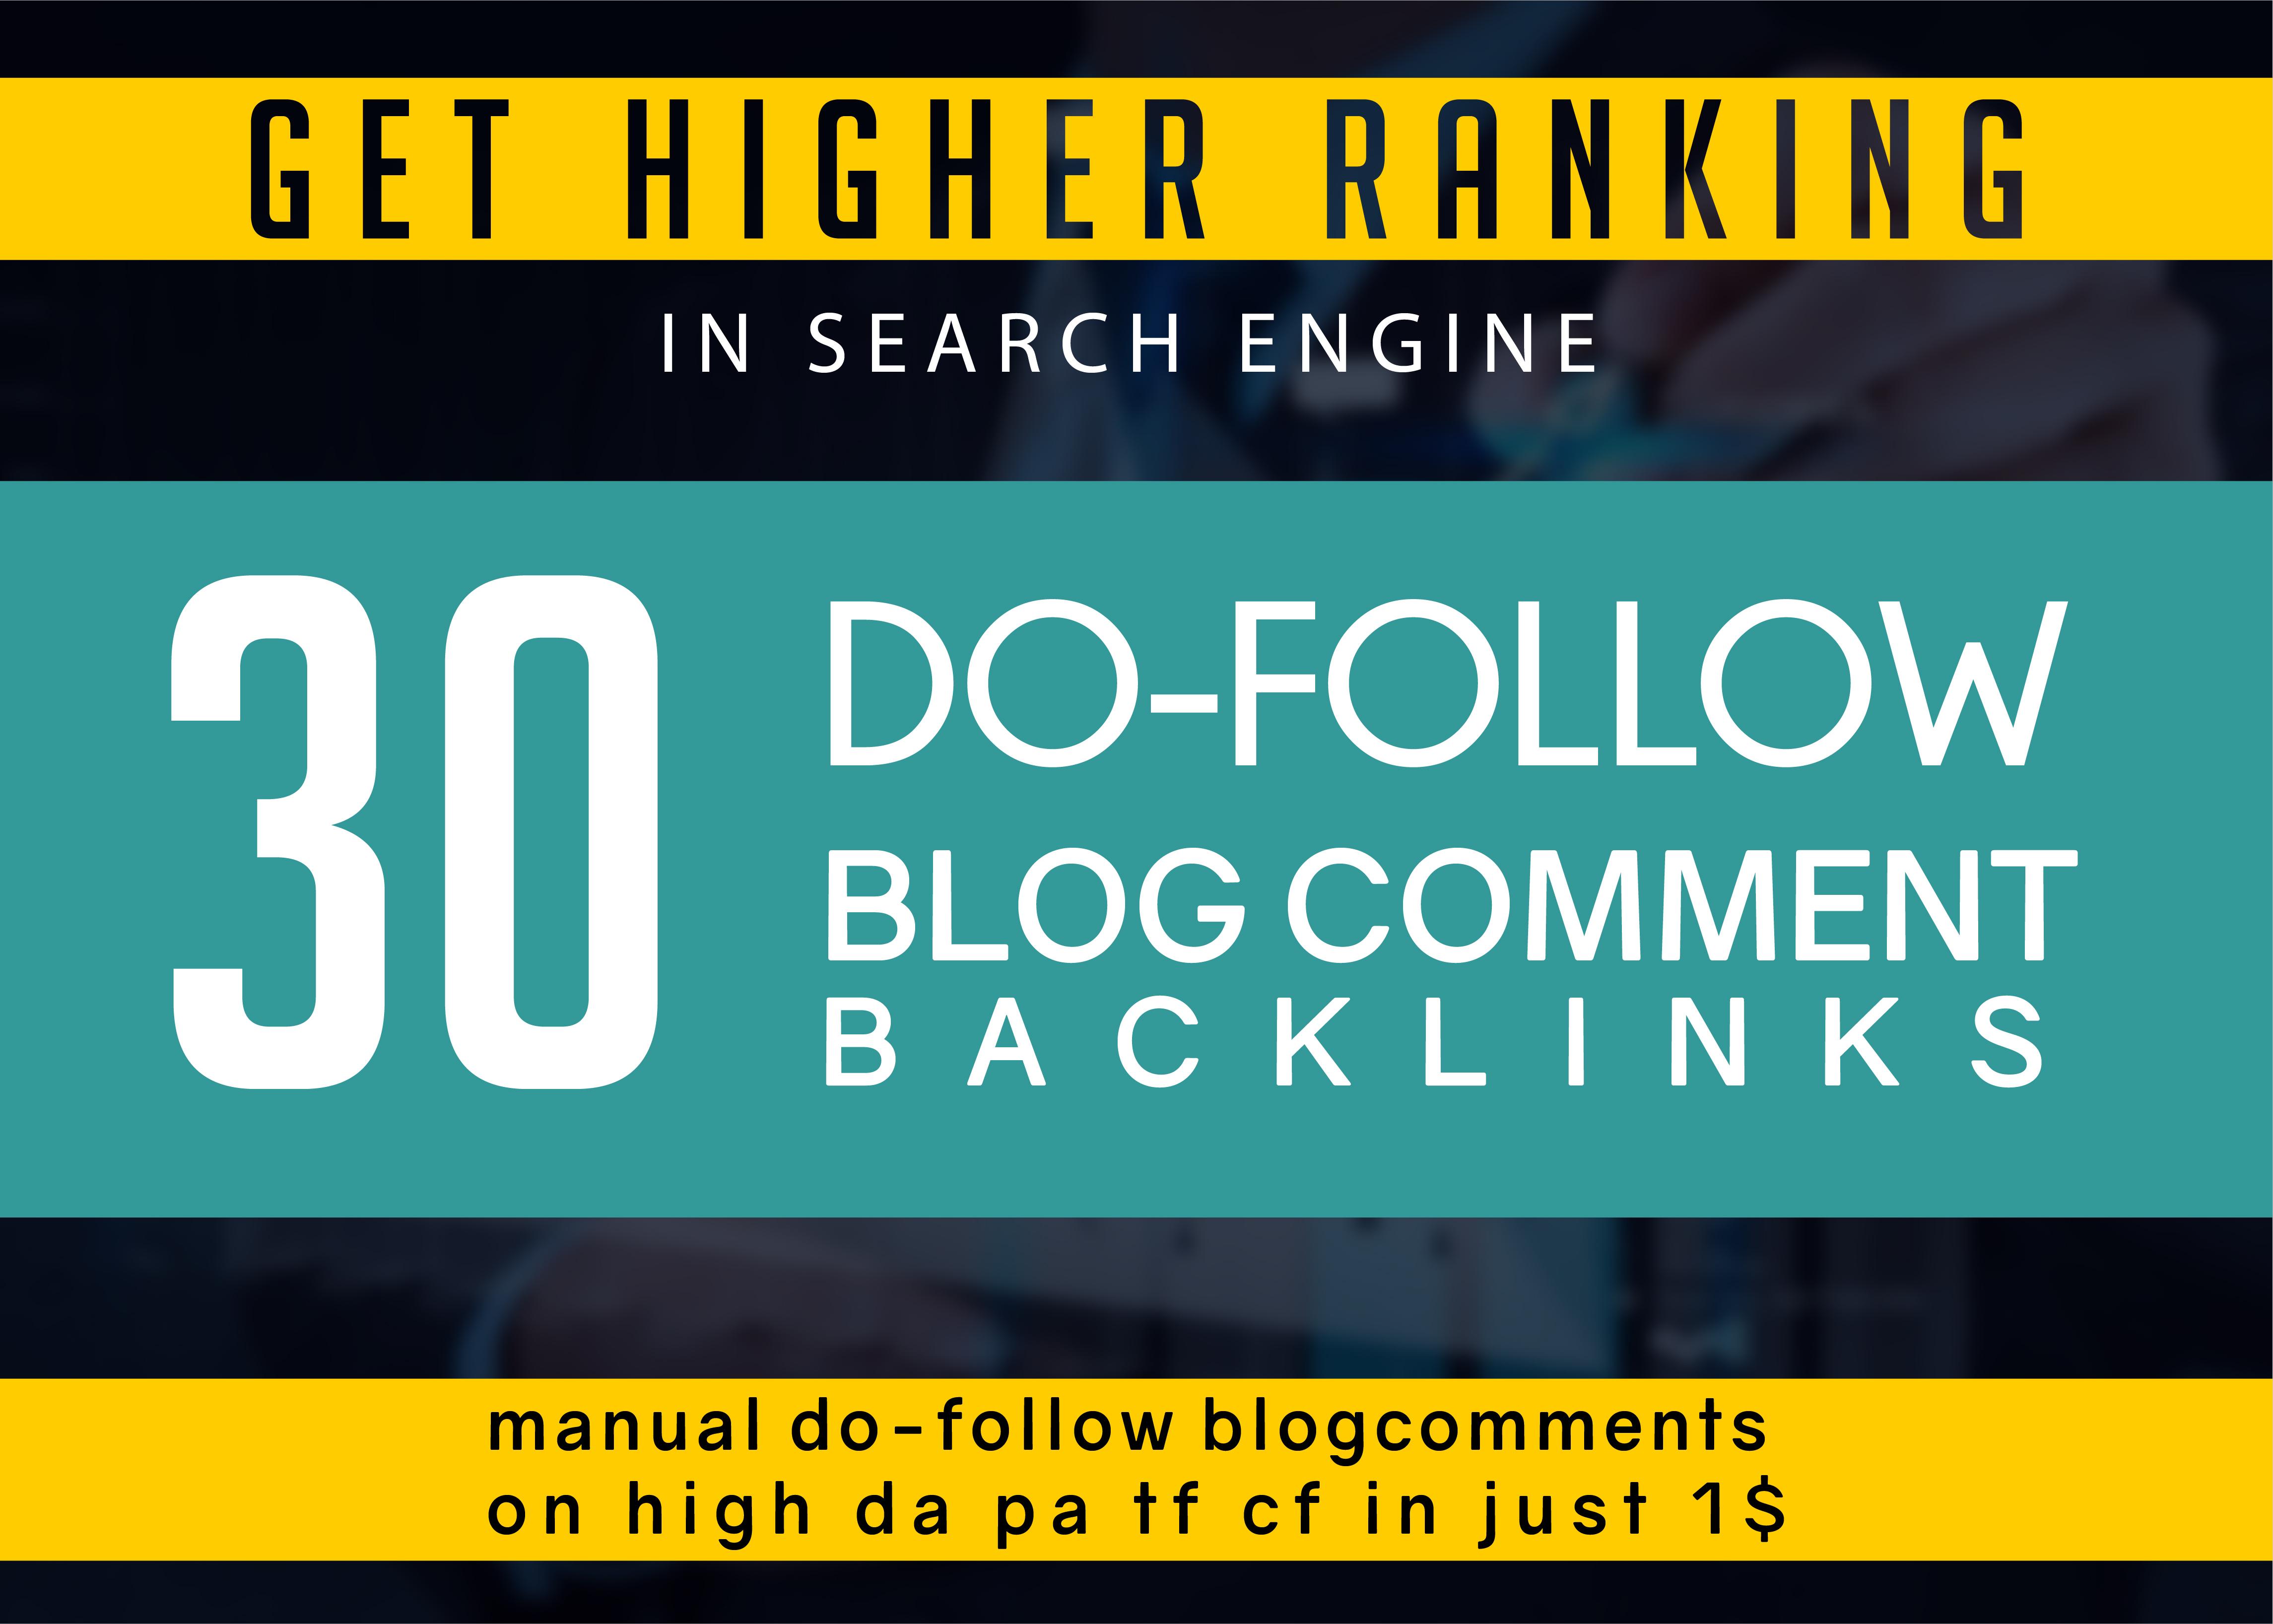 Provide Manual Do-follow blog comments backlinks on High DA PA